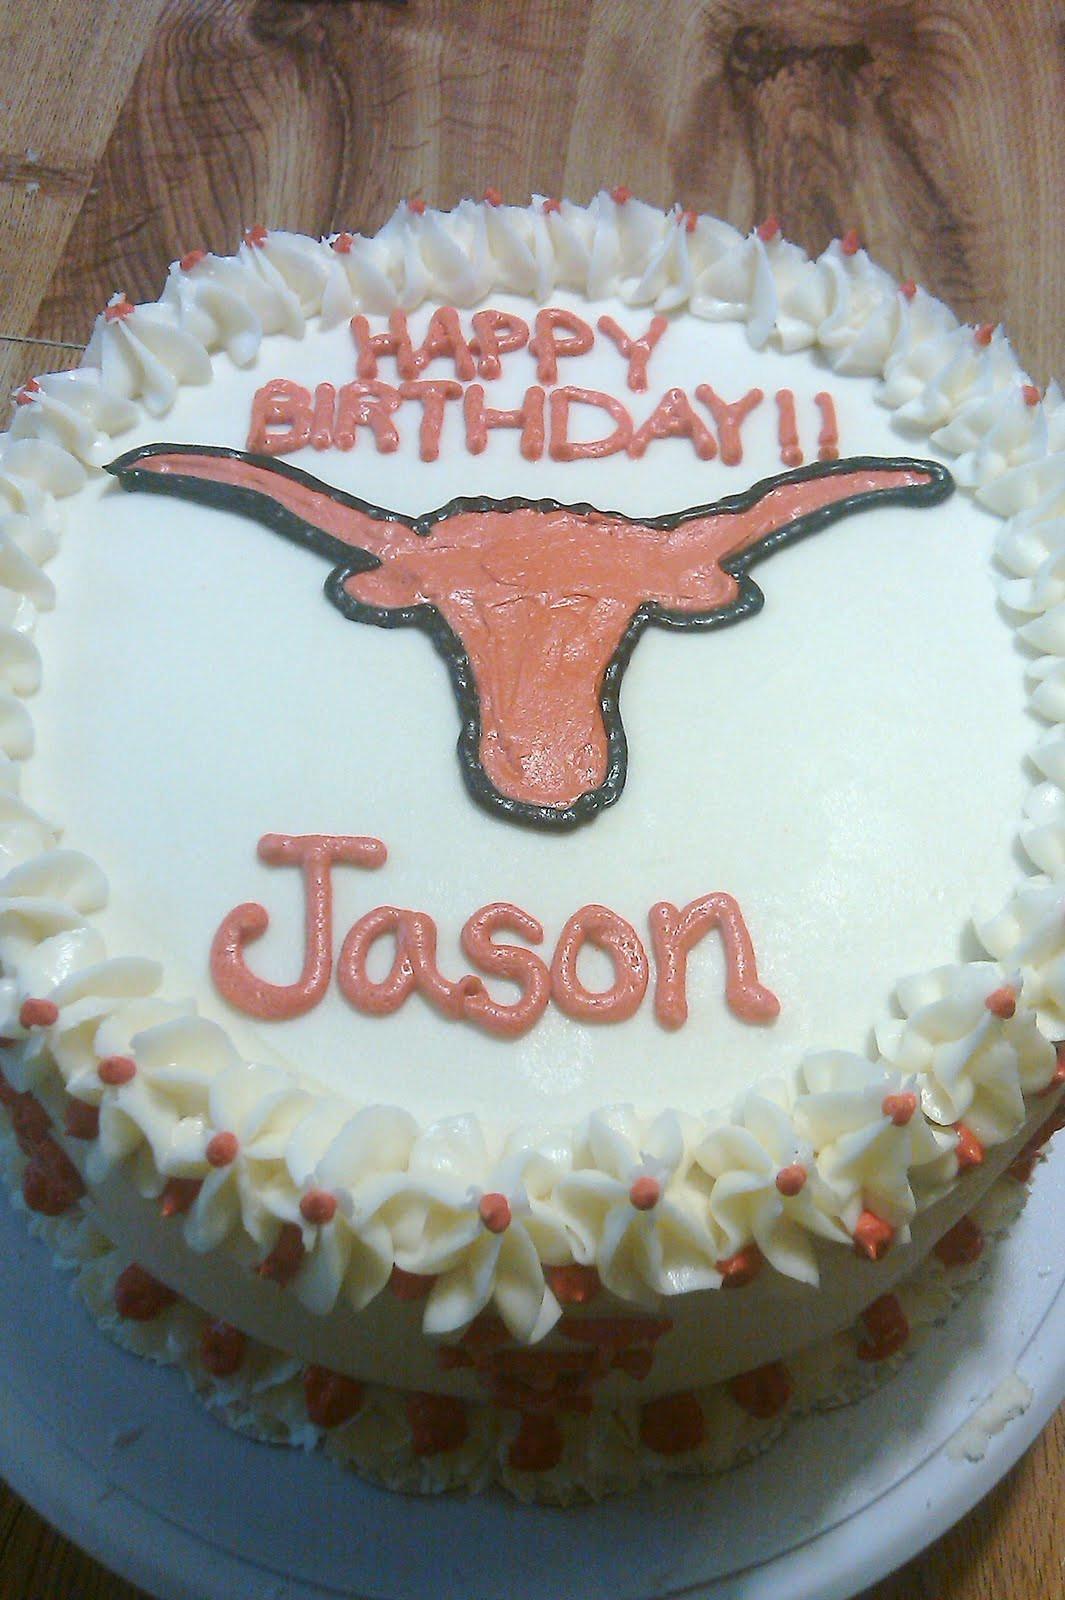 Best ideas about Happy Birthday Jason Cake . Save or Pin Cupcakes And More Happy Birthday Jason Now.